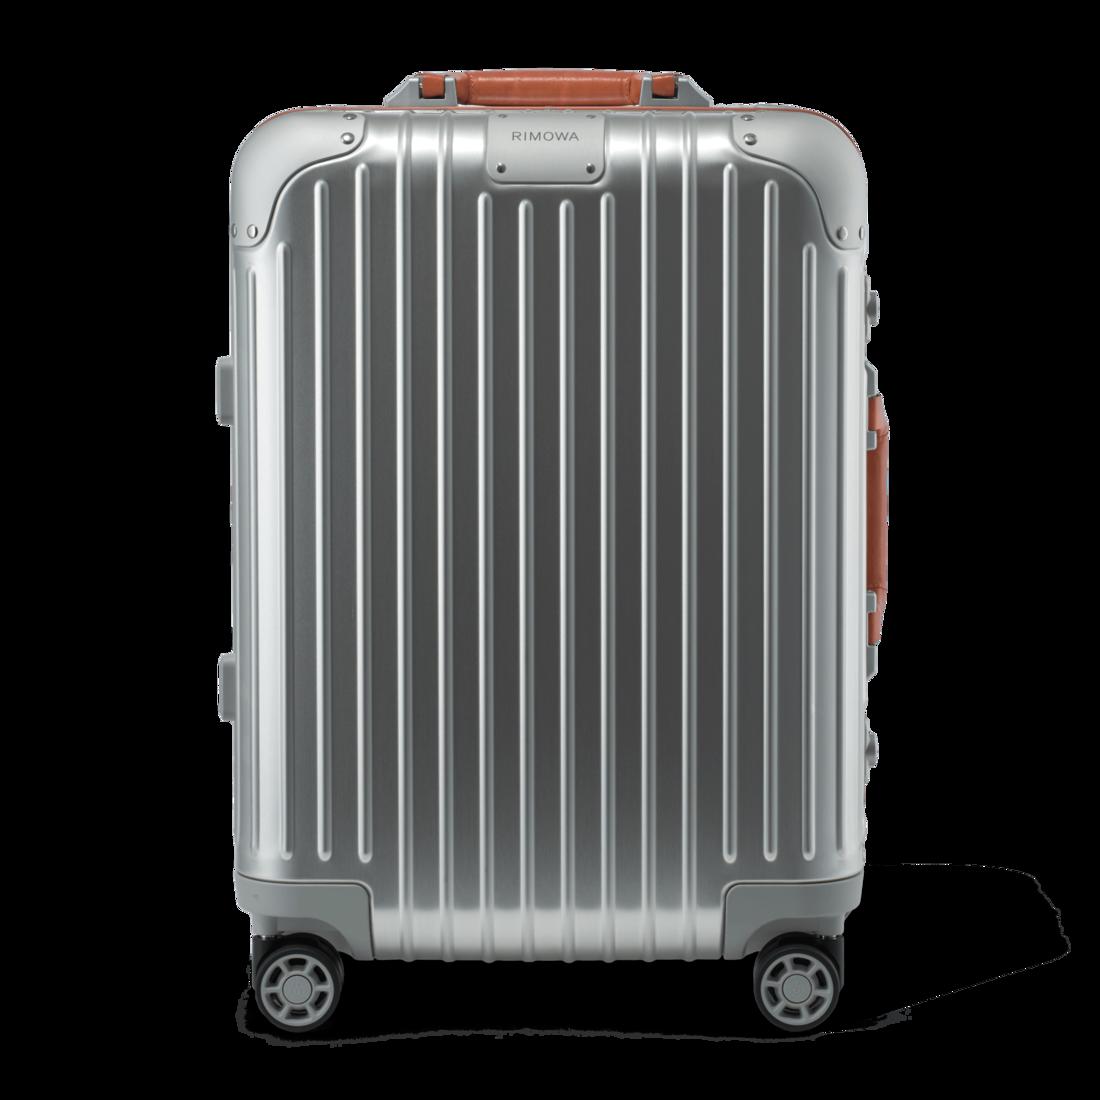 Original Cabin Twist Suitcase In Silver Brown Rimowa Rimowa Rimowa Luggage Carry On Suitcase